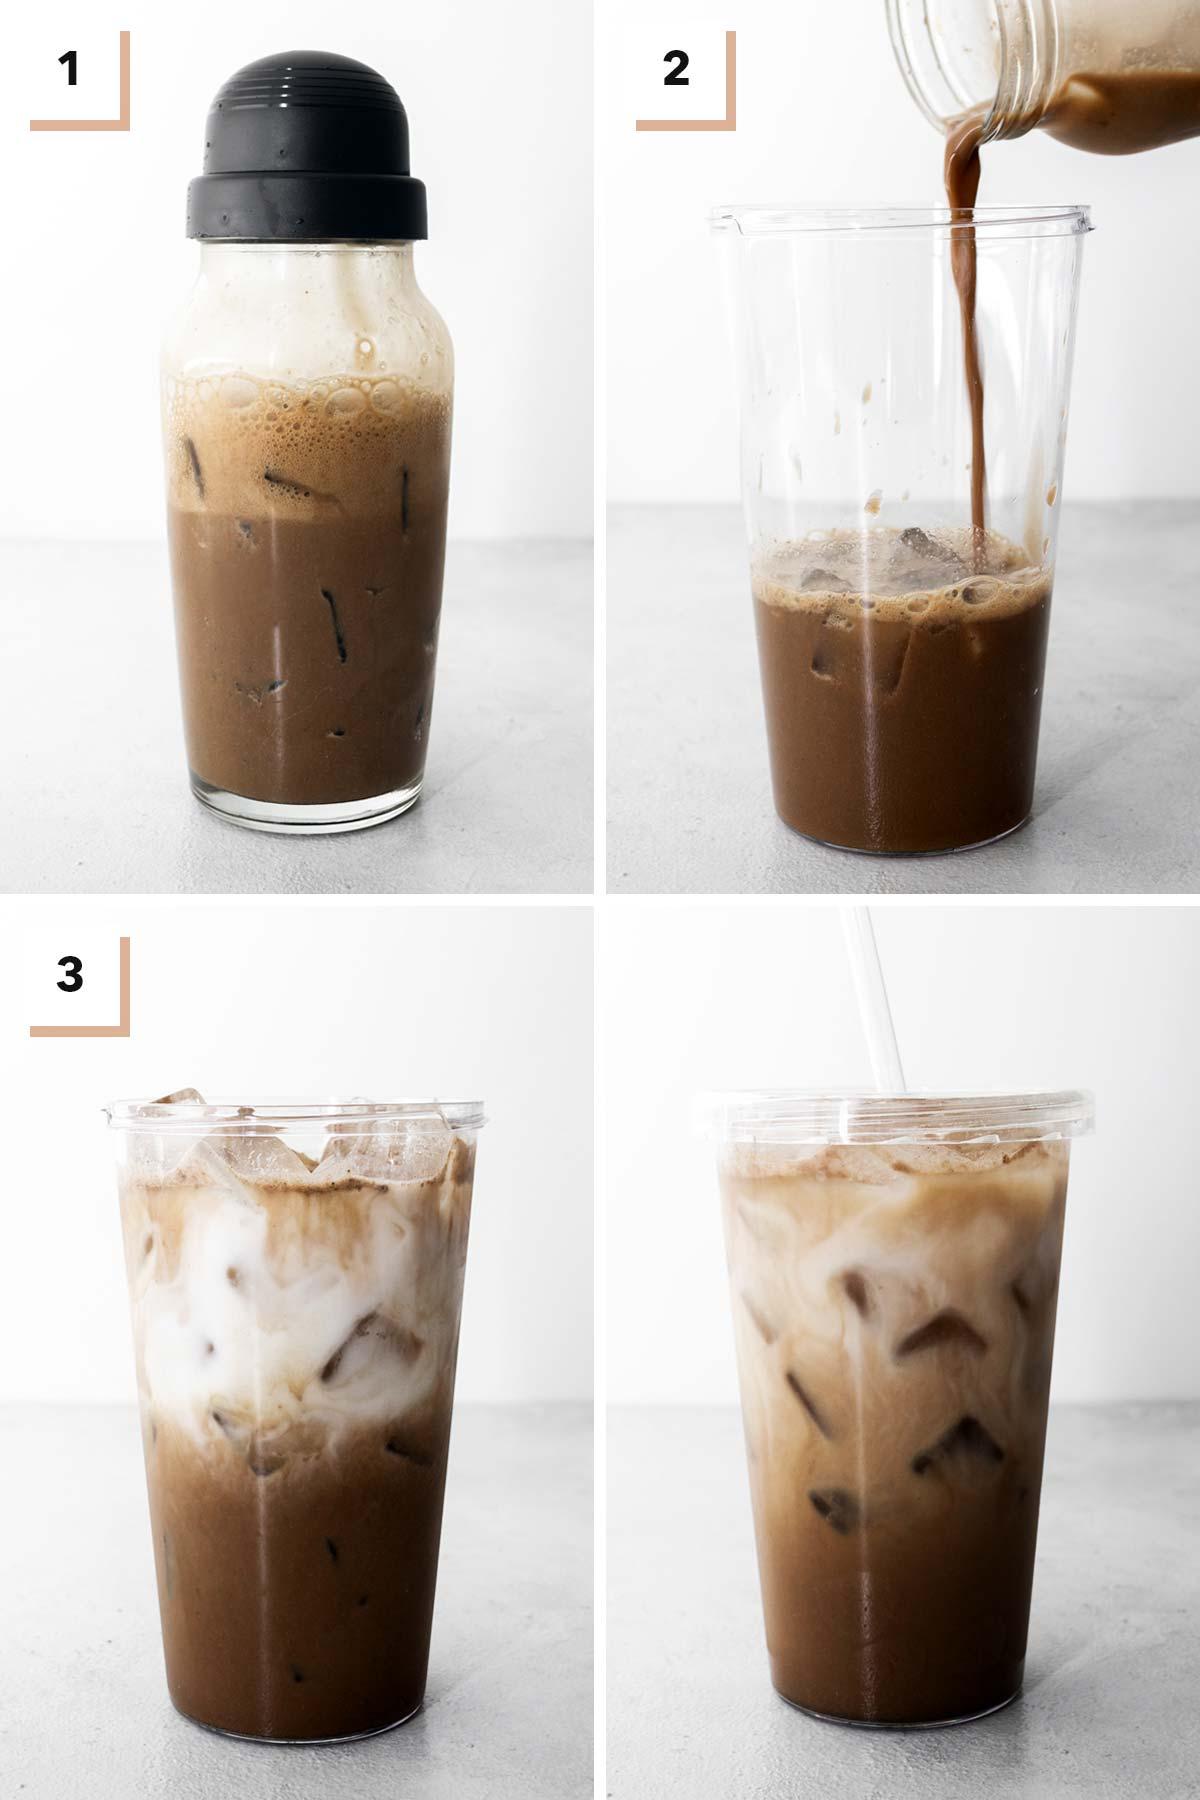 Four photo collage showing steps to make Starbucks Iced Chocolate Almondmilk Shaken Espresso Copycat.